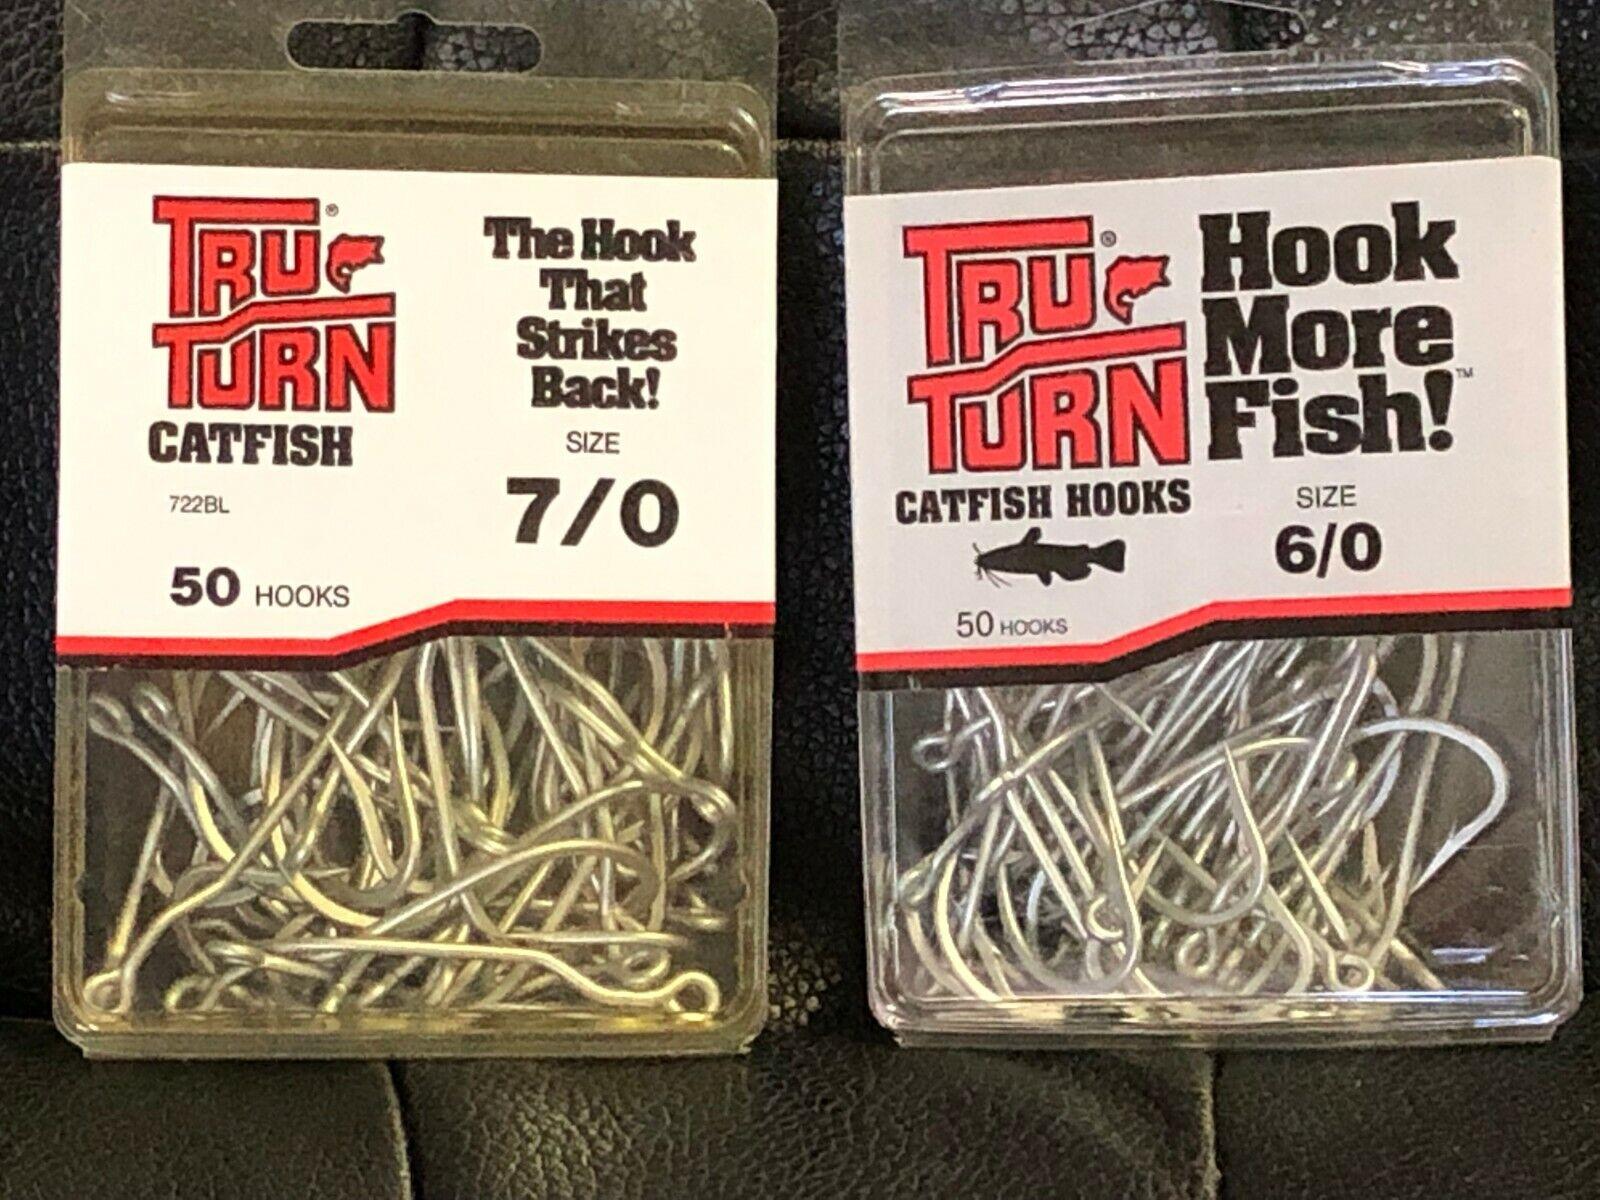 Tru-Turn 853BL-4 Blood Red Aberdeen Panfish 50 Pack Size 4 Fishing Hooks